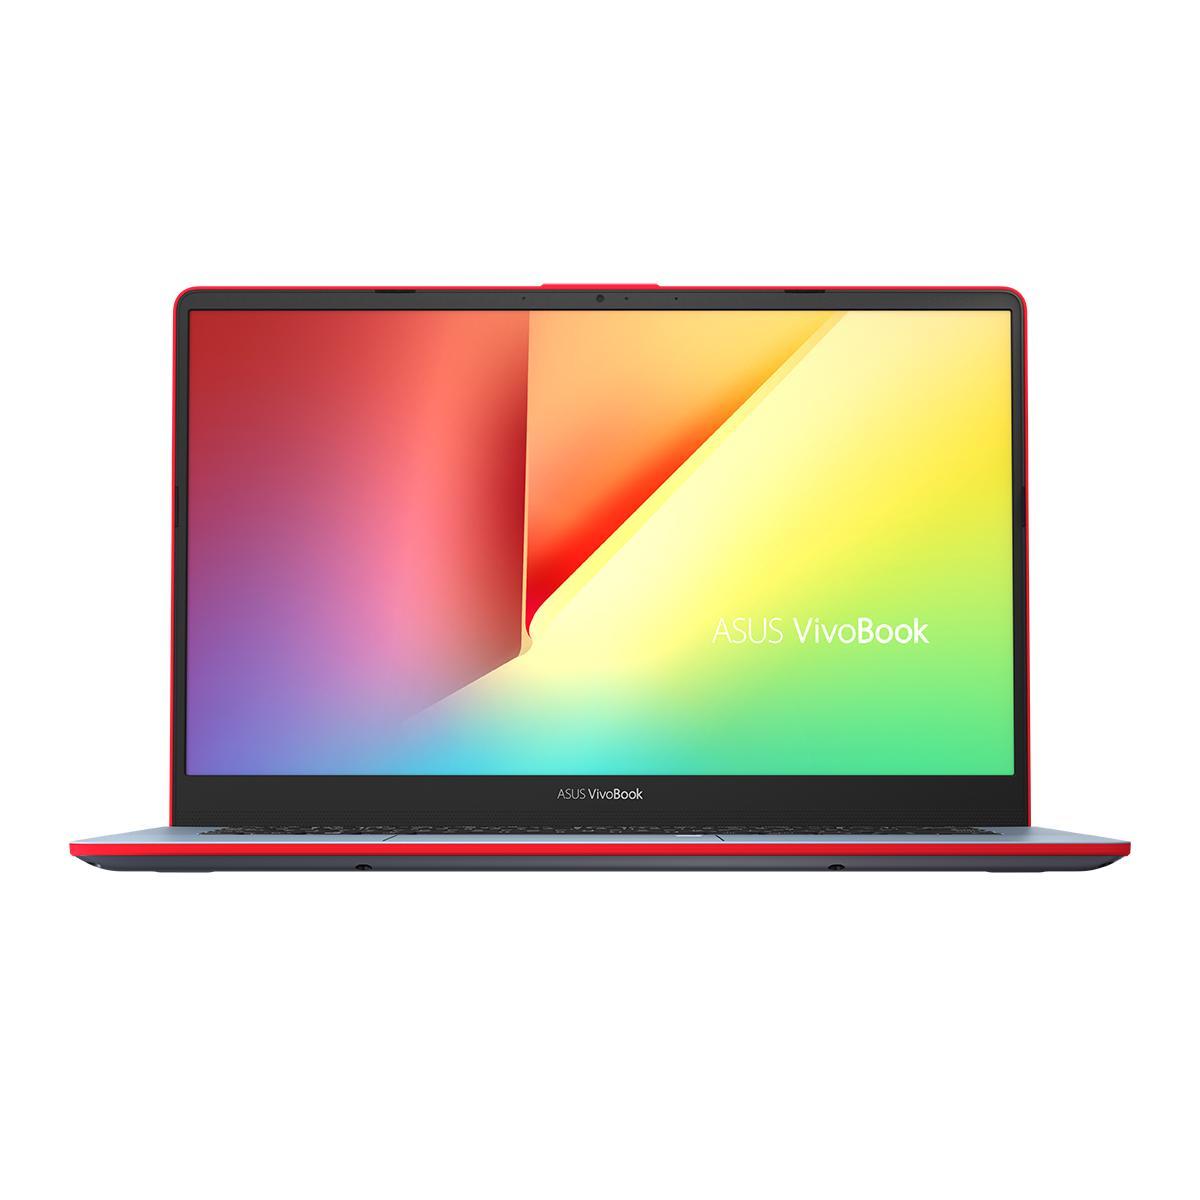 "ASUS VivoBook S15 S530FN-EJ090T Grijs, Rood Notebook 39,6 cm (15.6"") 1920 x 1080 Pixels Intel® 8ste generatie Core™ i5 8 GB DDR4-SDRAM 256 GB SSD Windows 10"